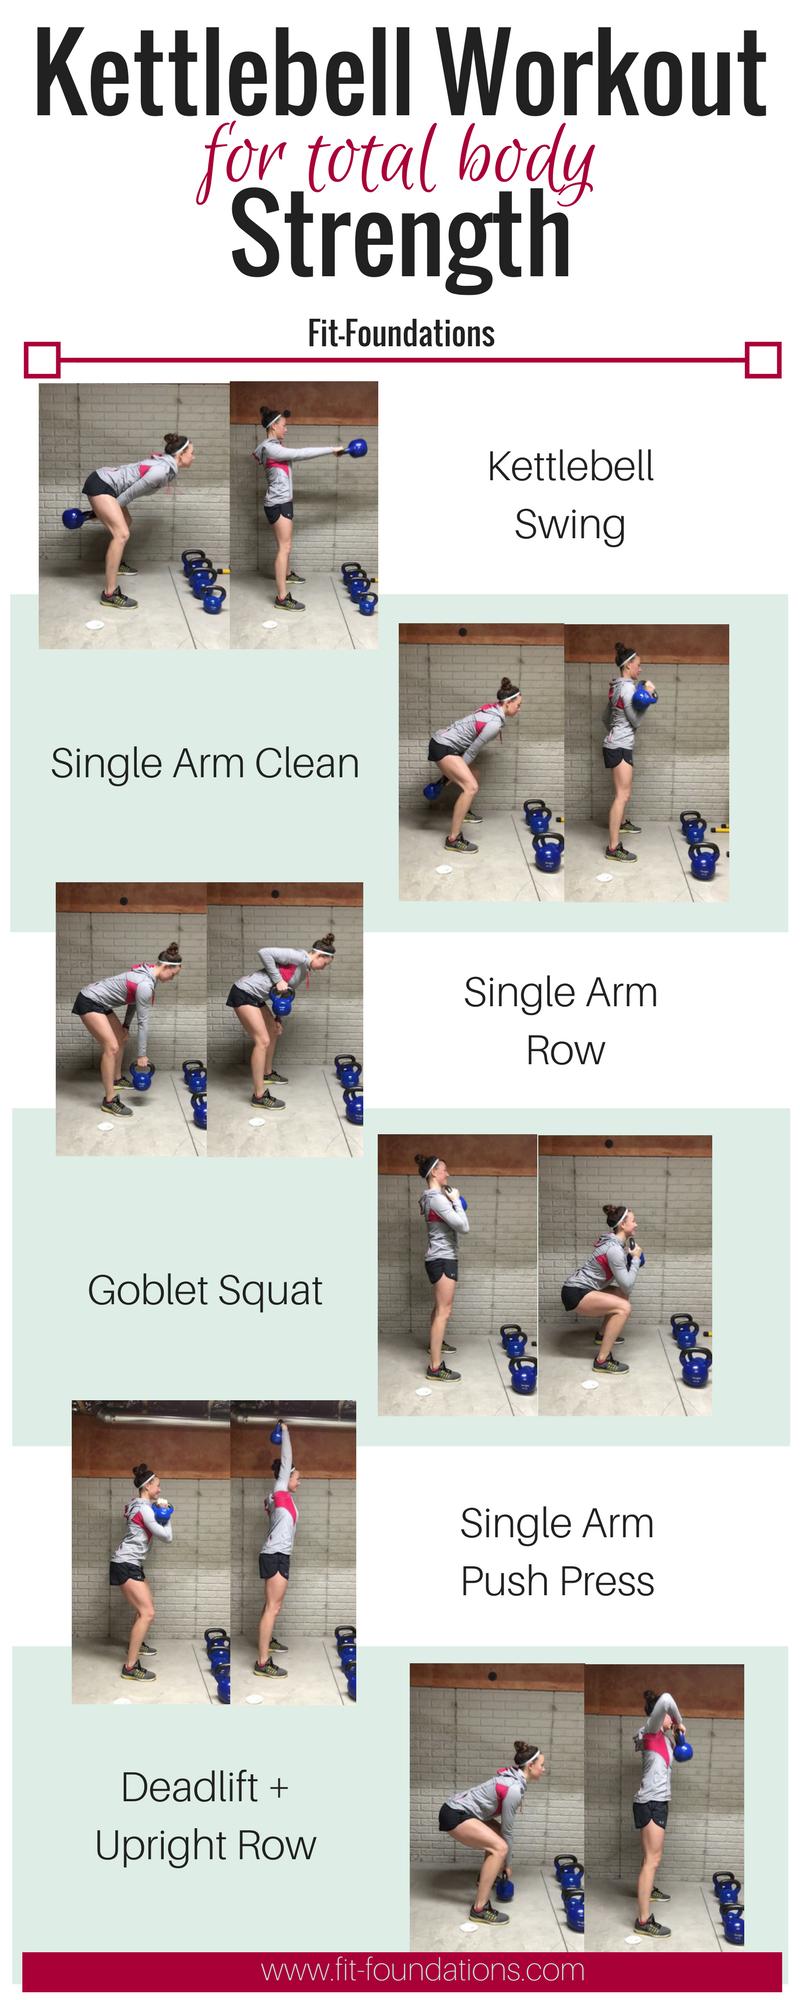 Kettlebell-Workout.png